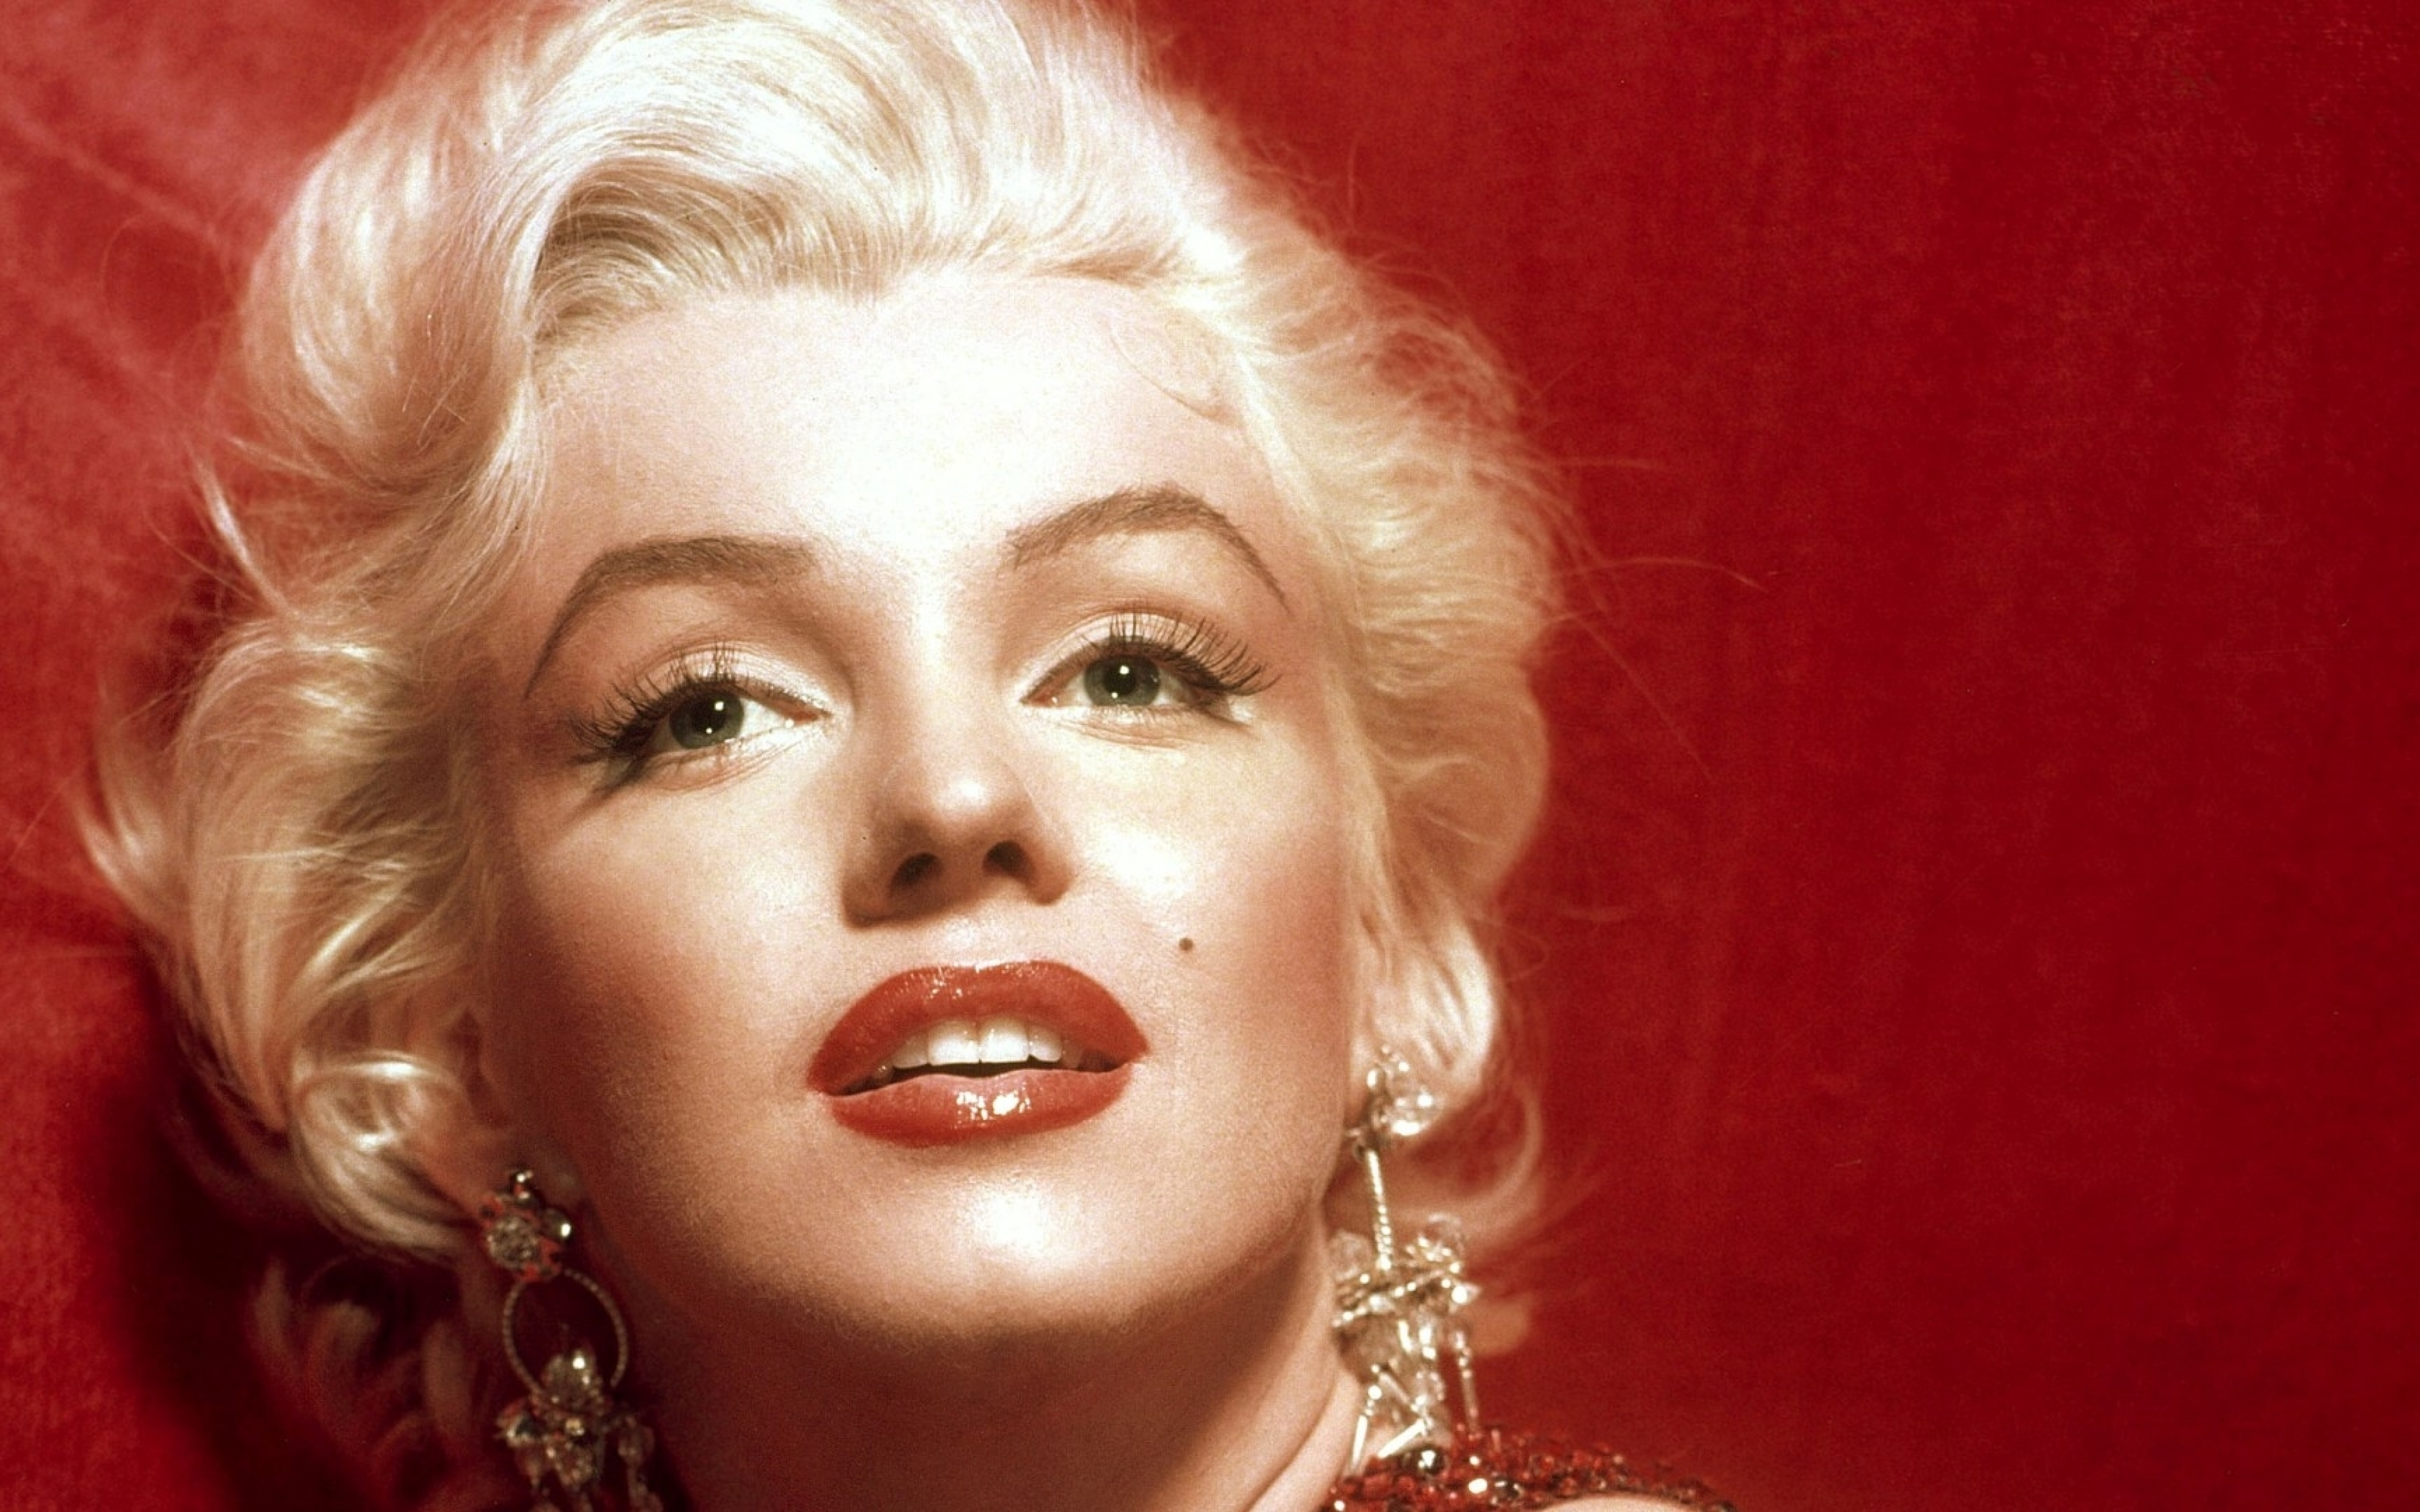 Download marilyn monroe hot eye photoshoot 480x800 resolution full hd wallpaper - Marilyn monroe wallpaper download ...